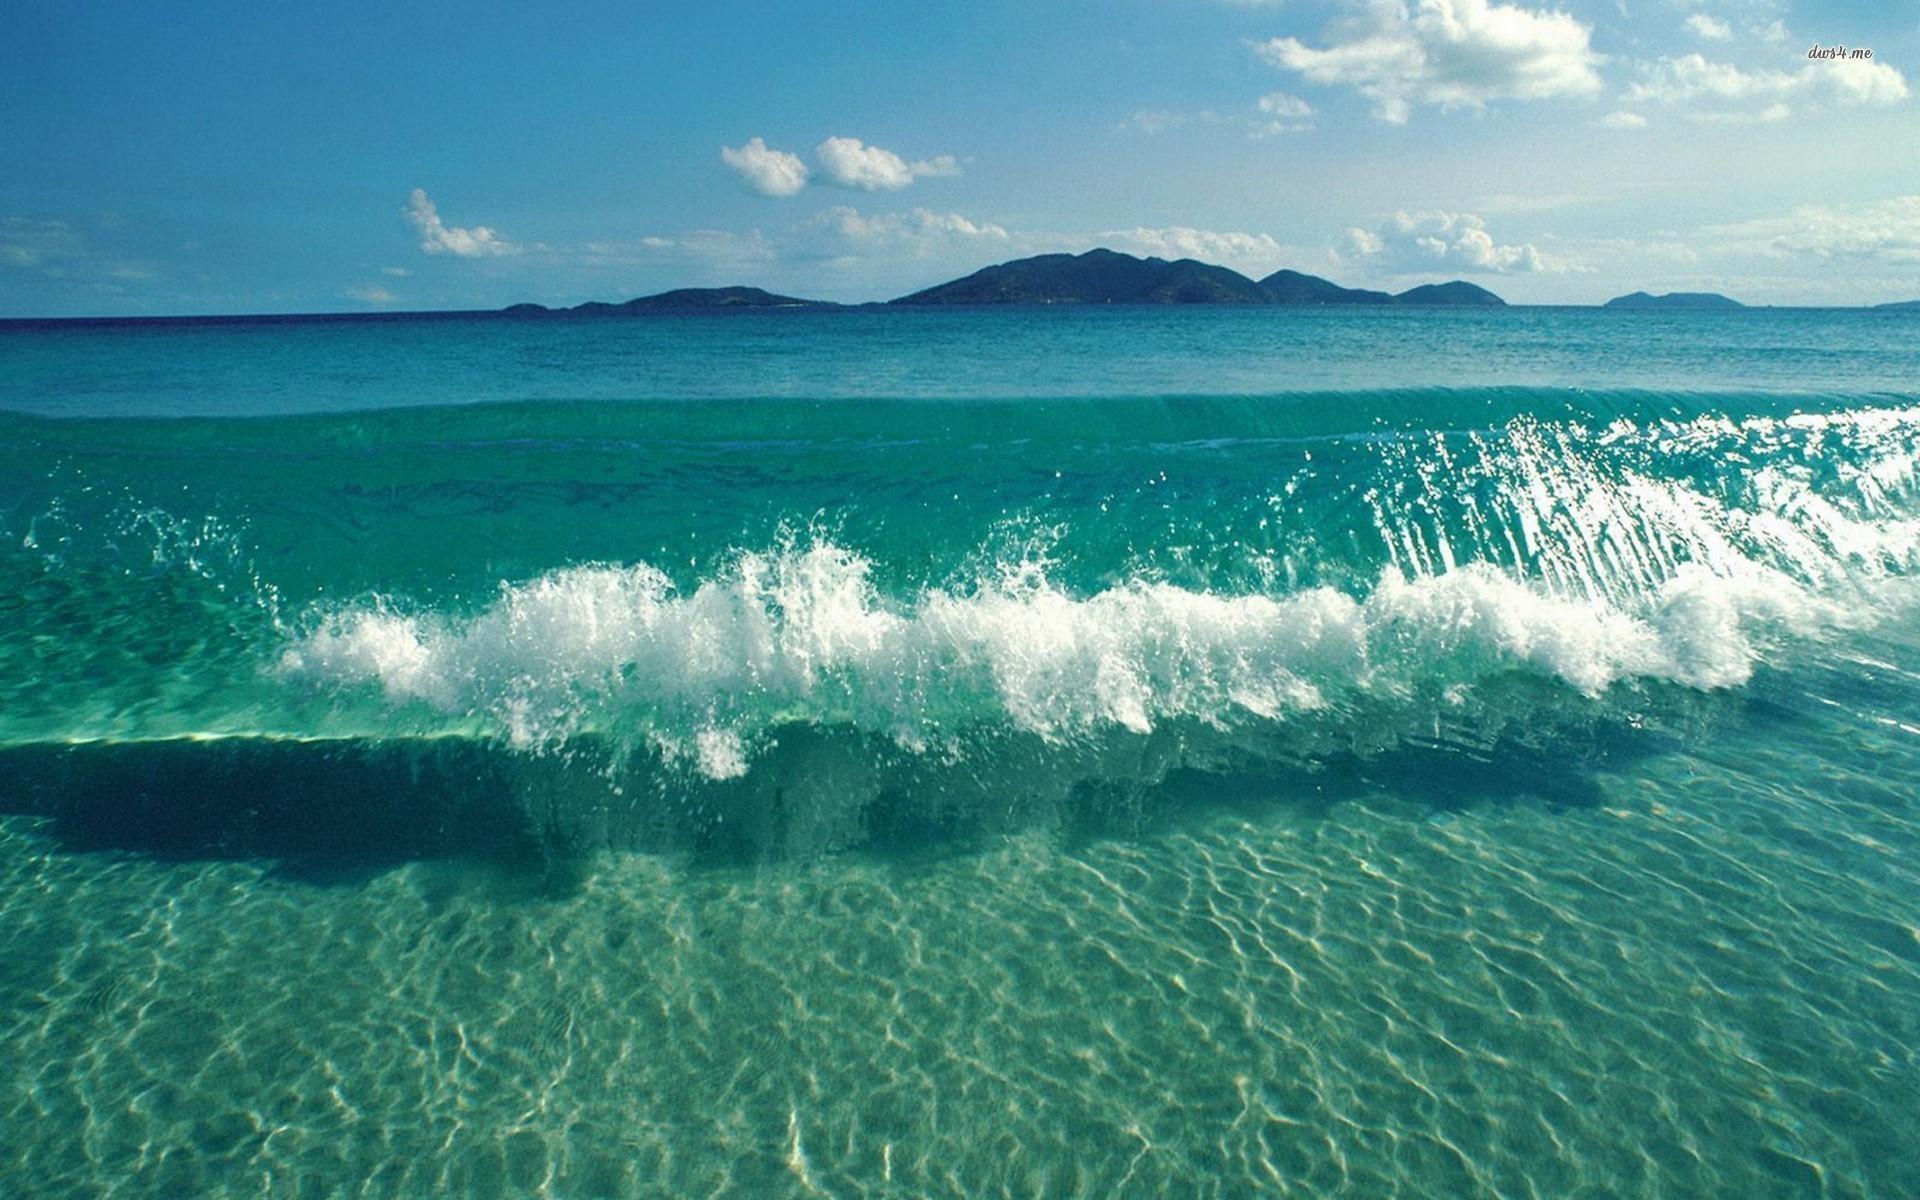 Ocean Waves Wallpaper High Quality